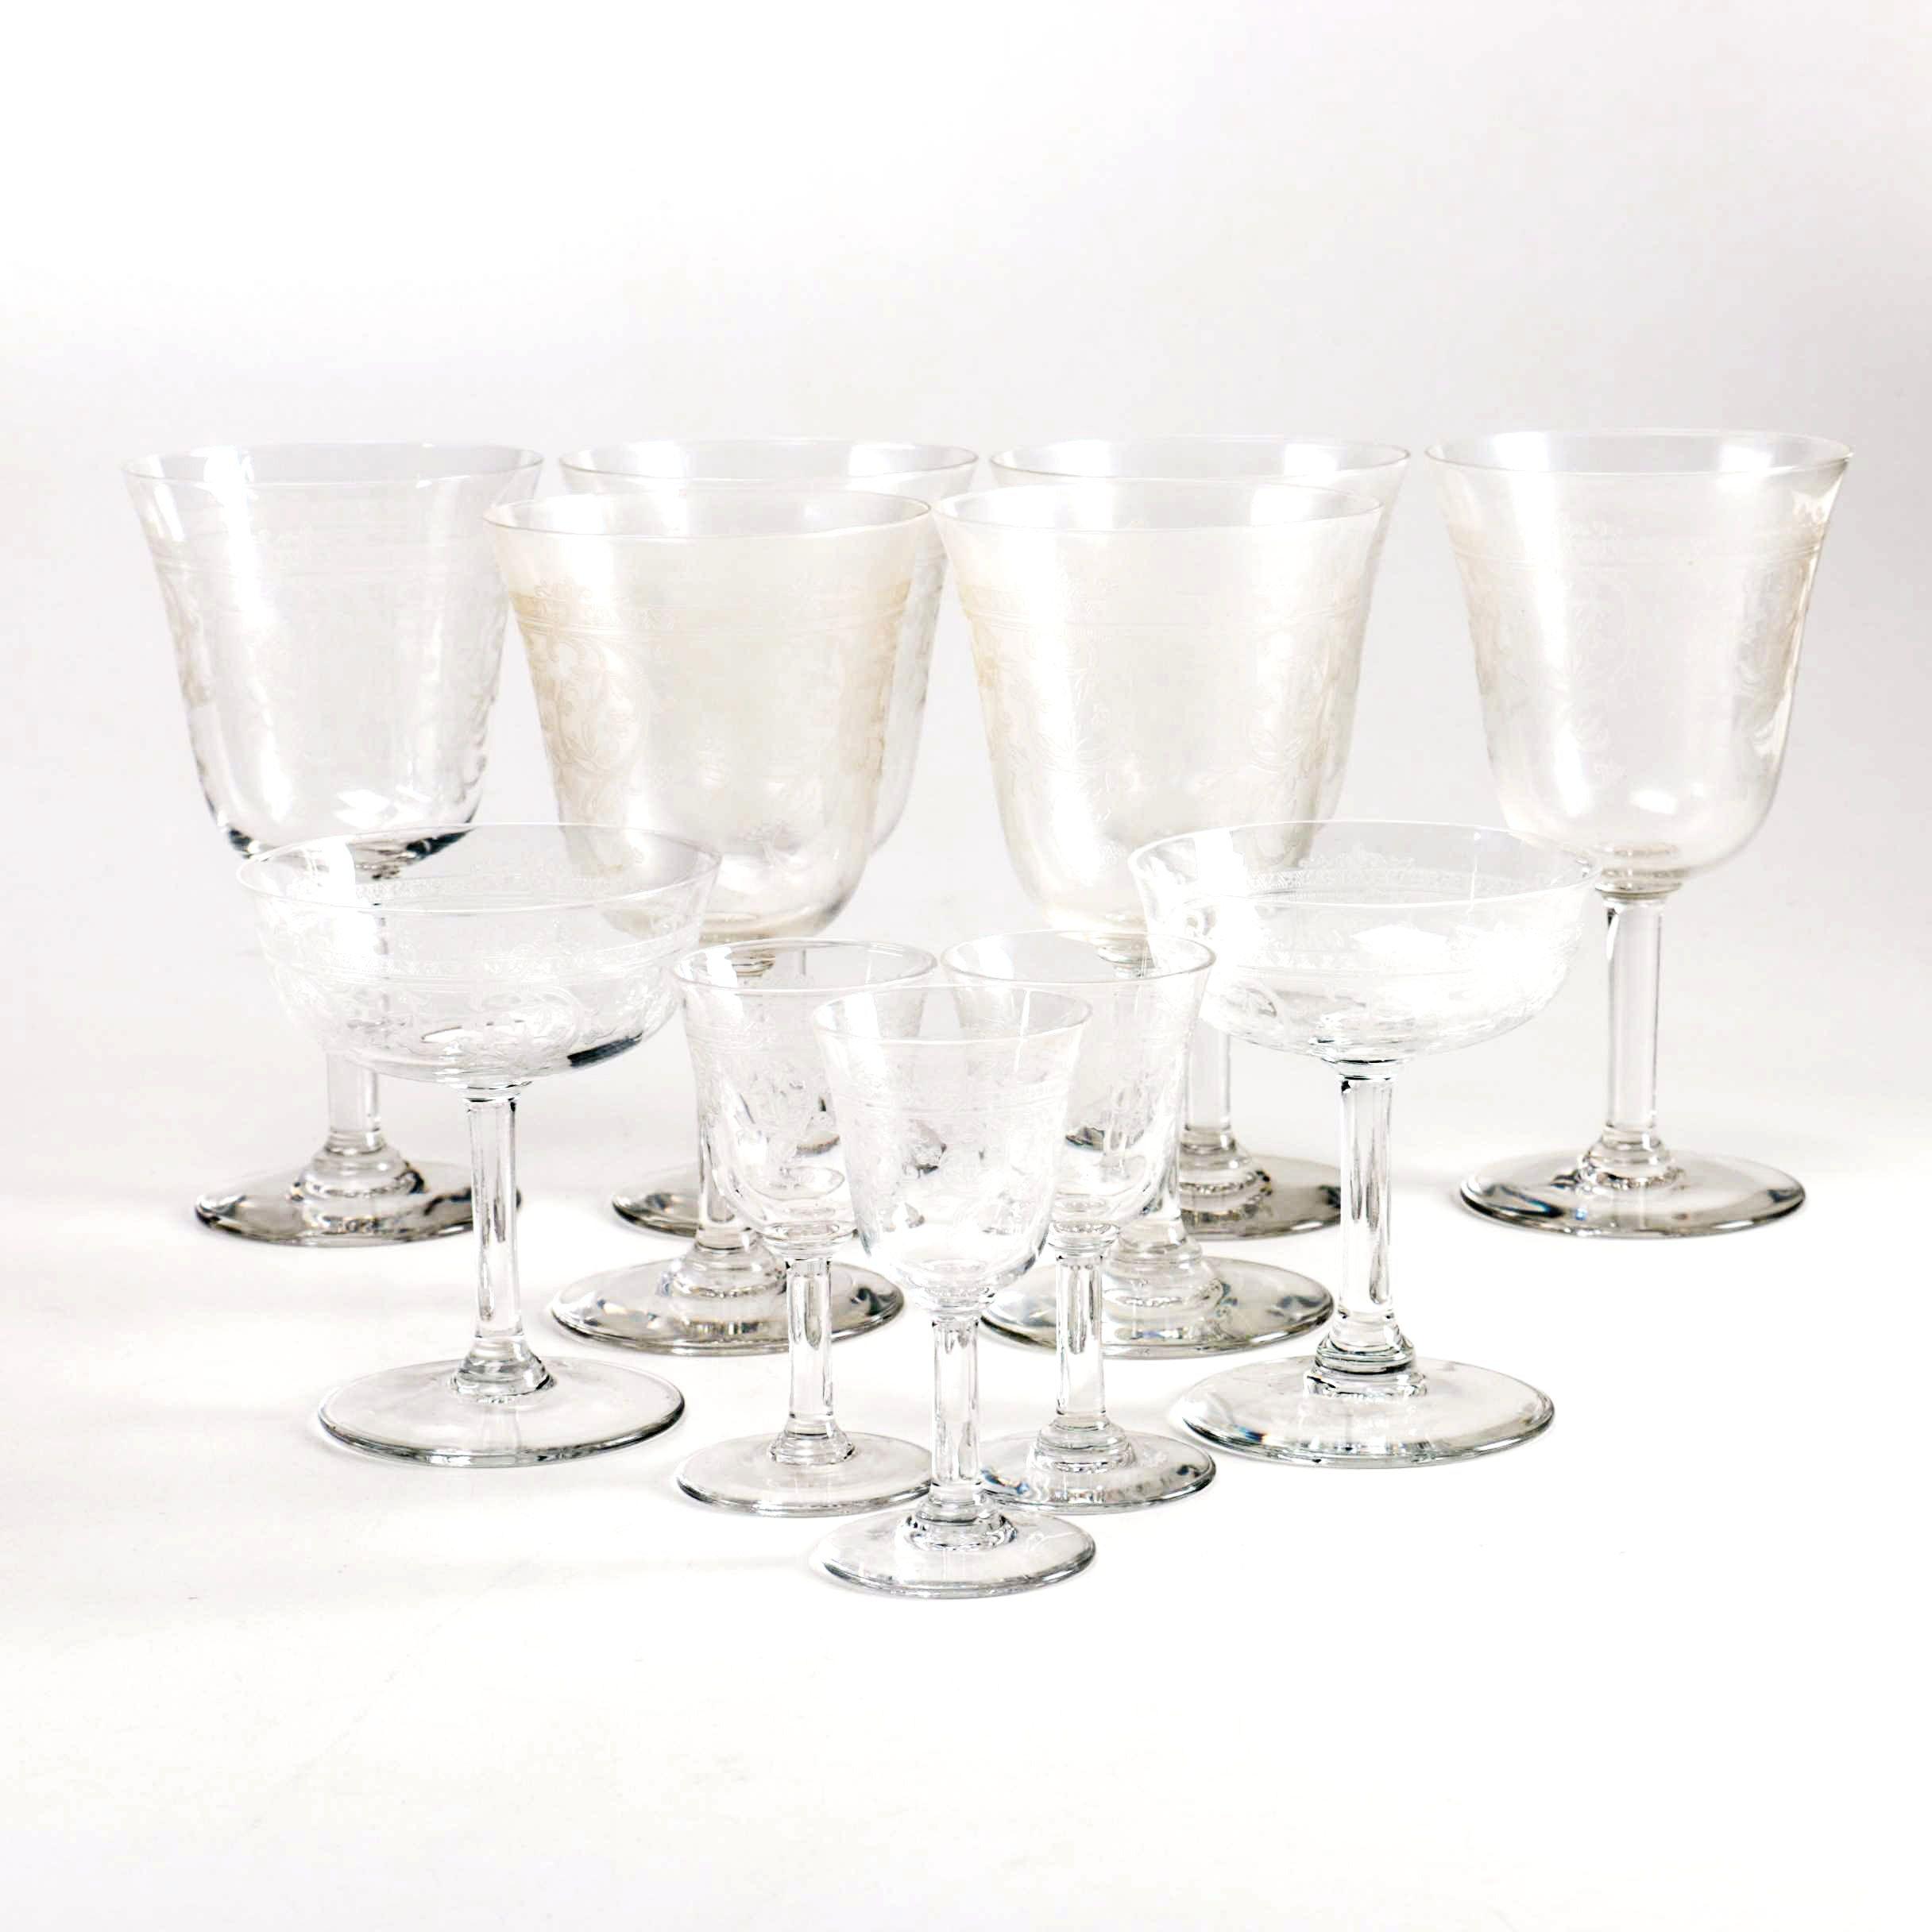 Glass Goblet Assortment